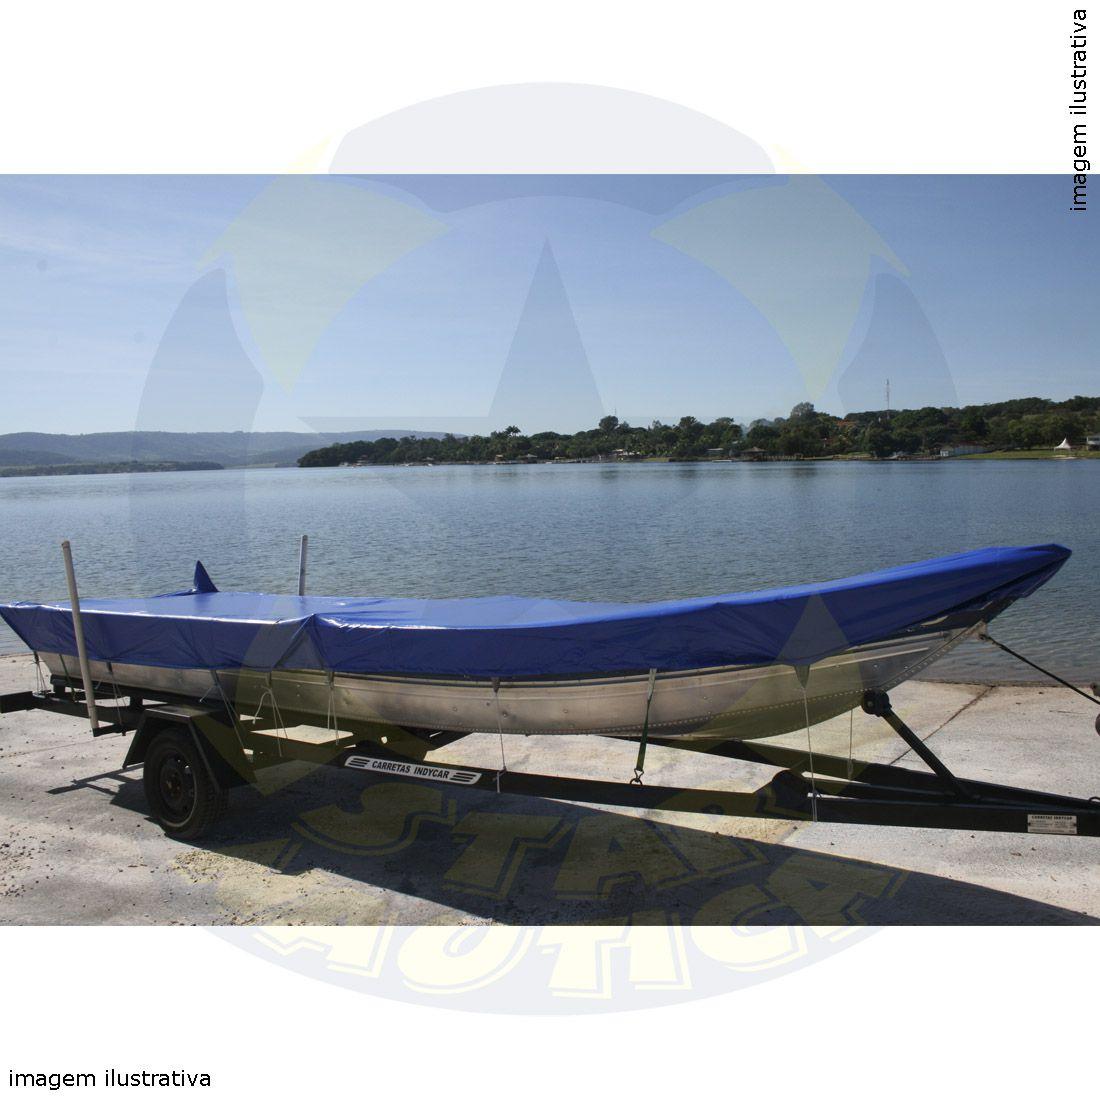 Capa Lona de Cobertura Barco Boto 6000 Lona Vinílica